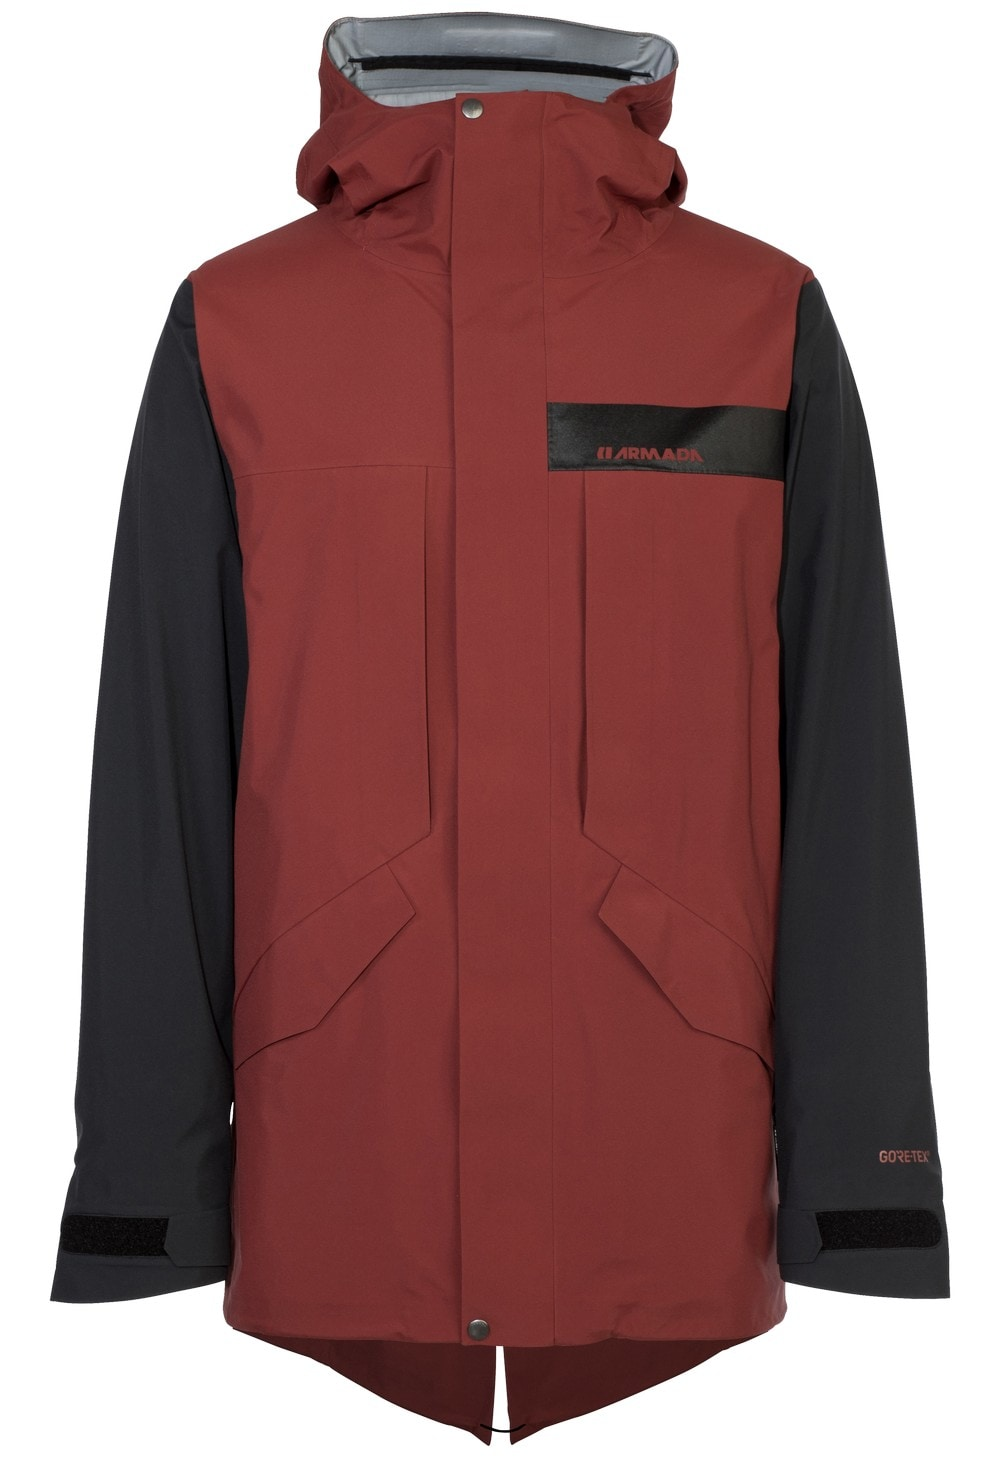 Armada Lifted GTX 3L Jacket Port Red